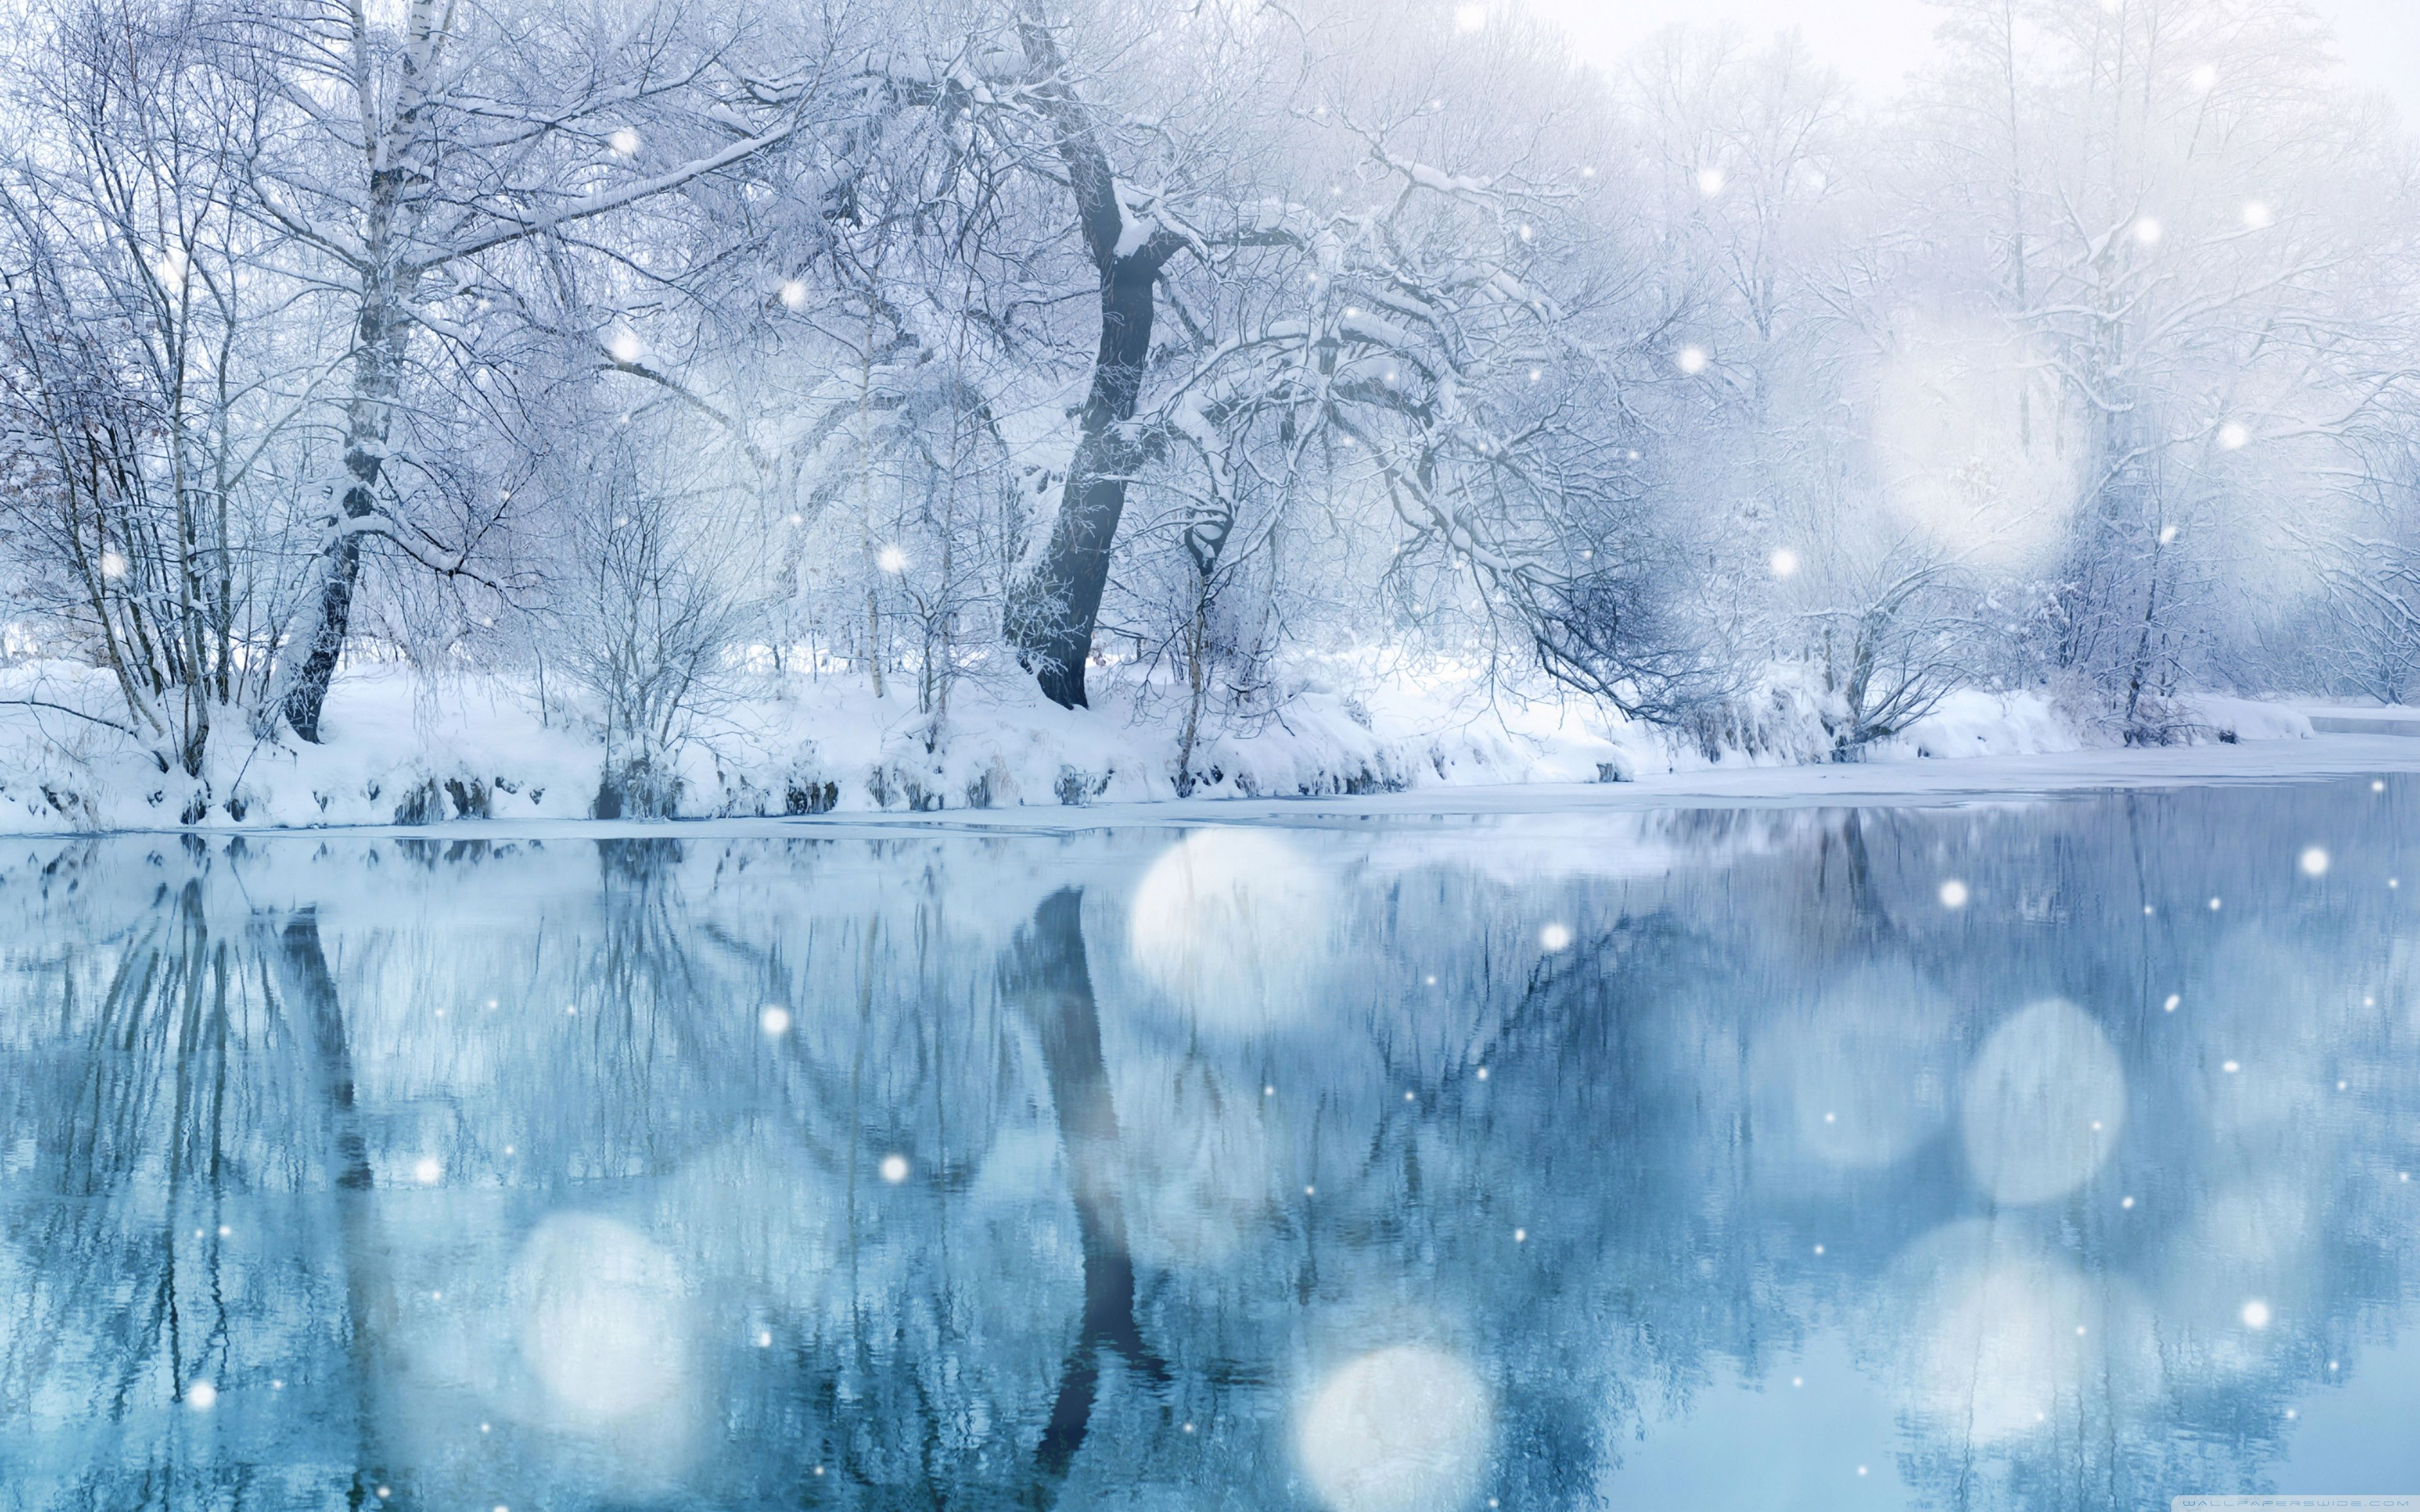 Snowfall Wallpapers Top Free Snowfall Backgrounds Wallpaperaccess